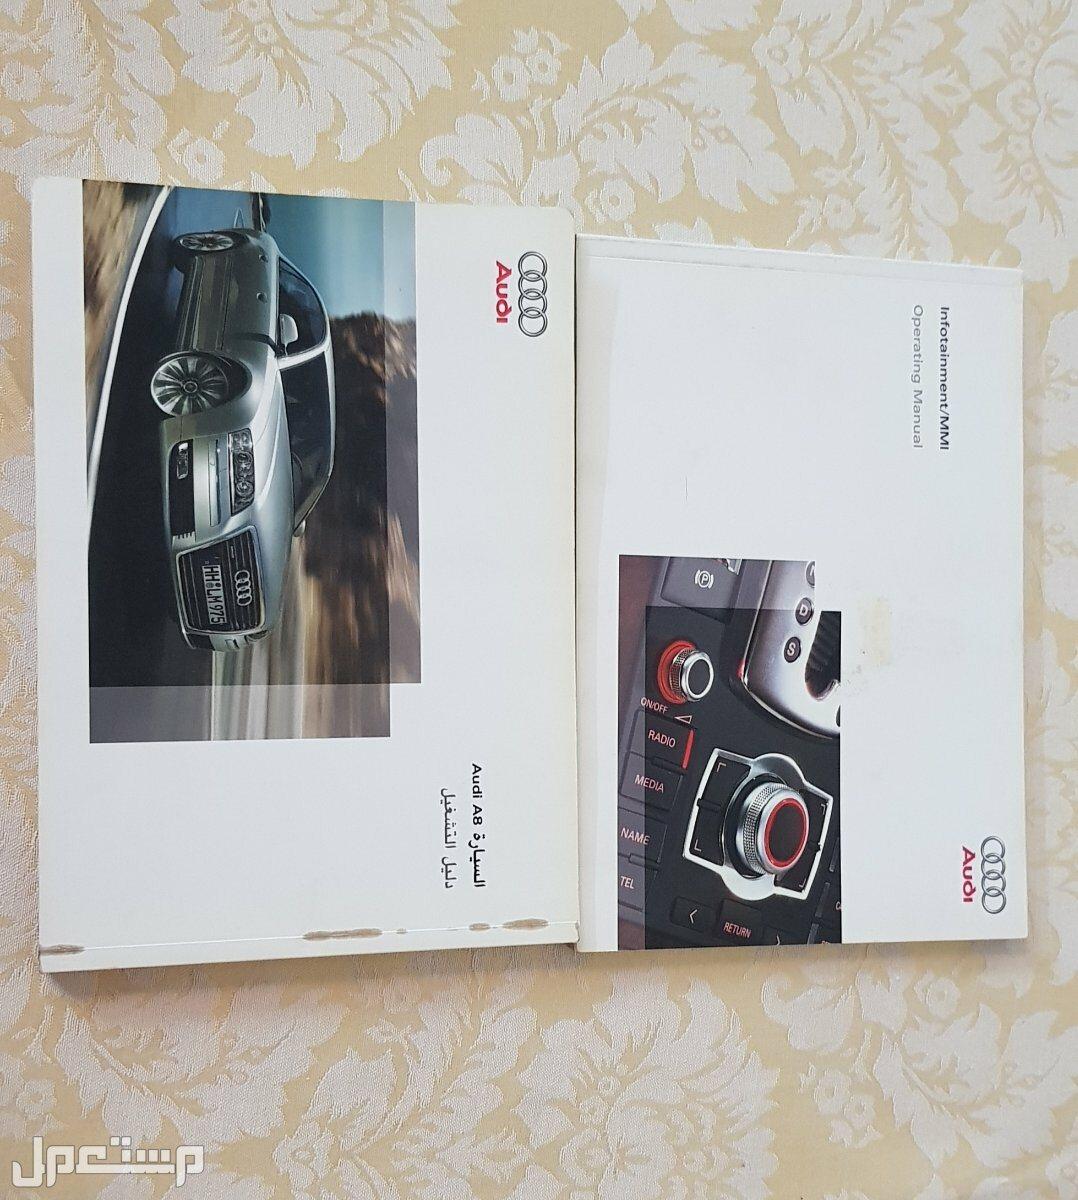 دليل سيارة اودي A8 وتلفون سيارة لا سلكي وريموت كنترول